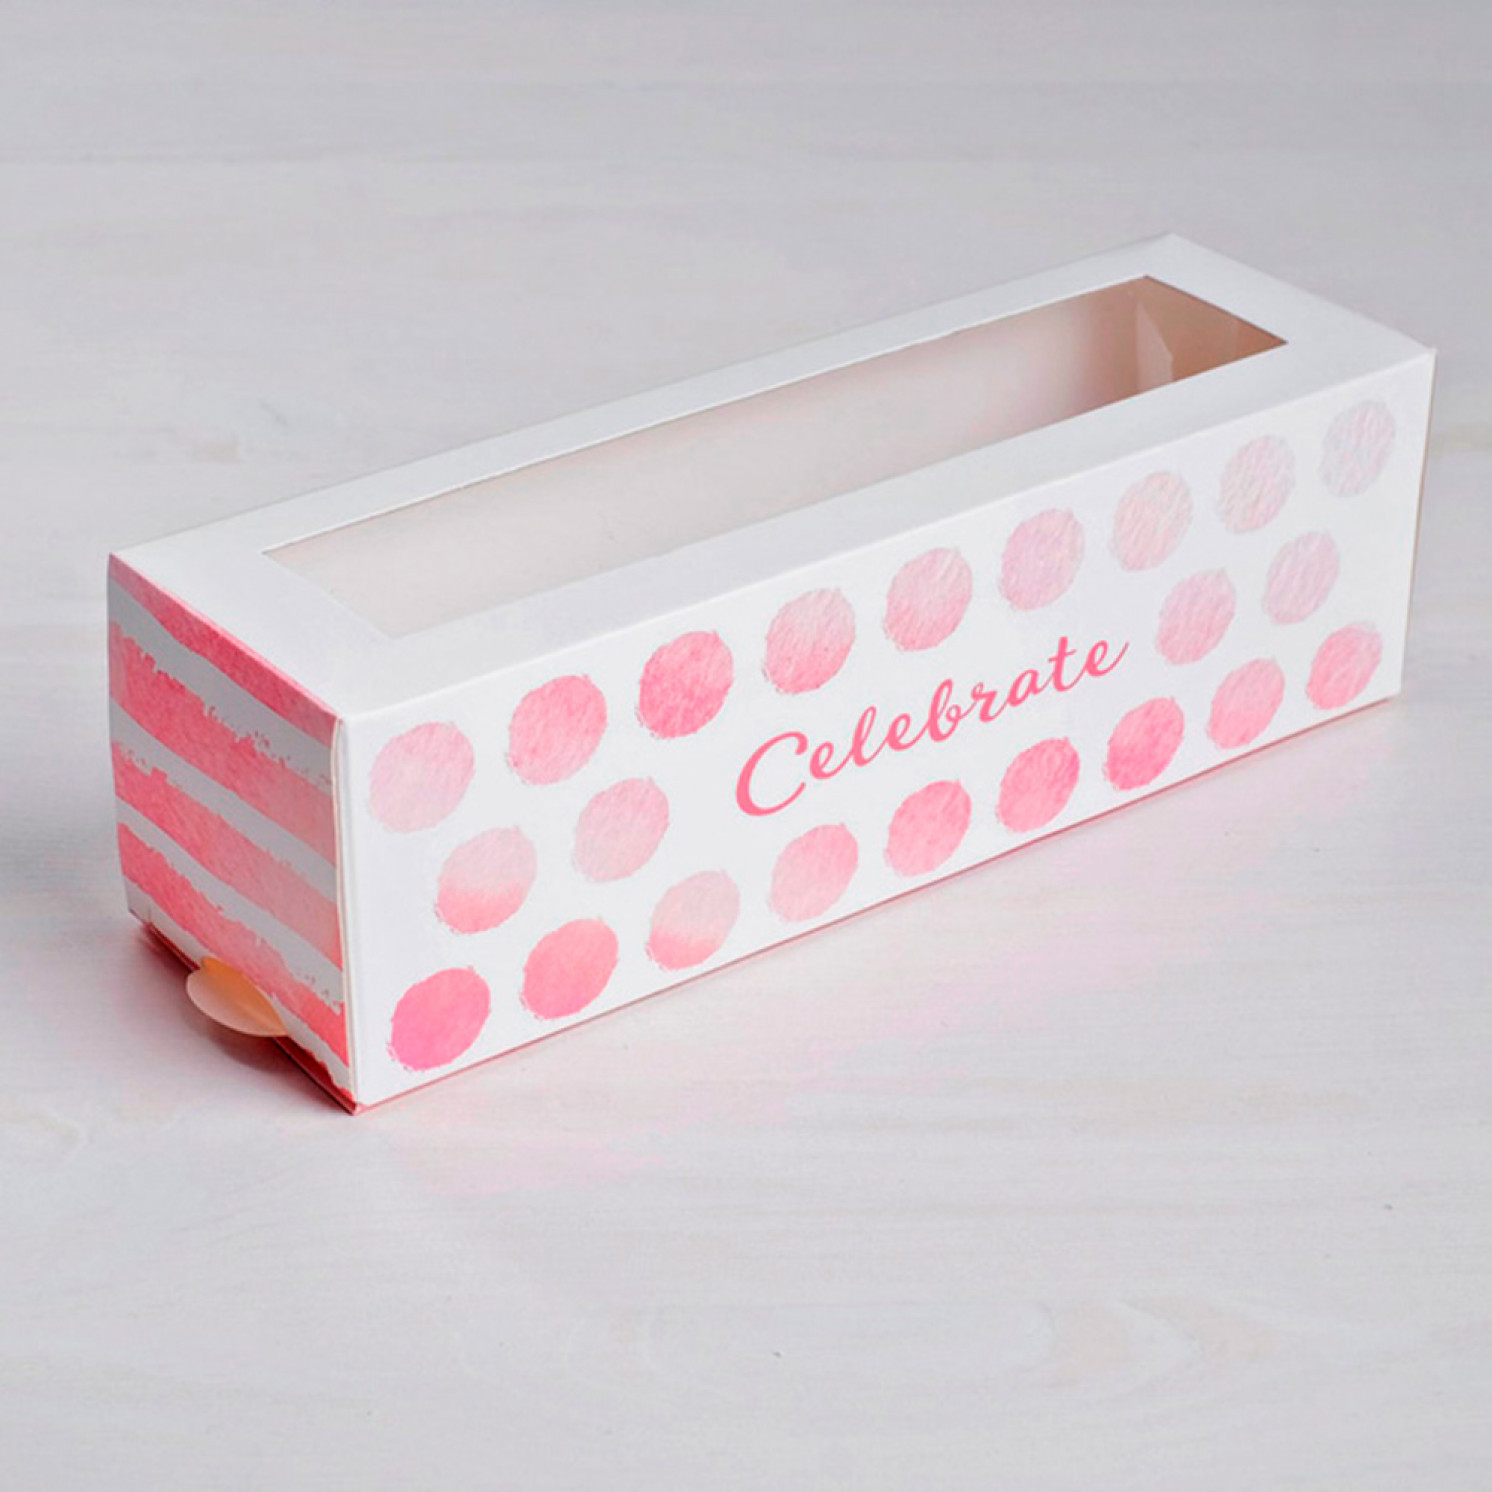 Коробка складная Celebrate 18 х 5,5 х 5,5 см.